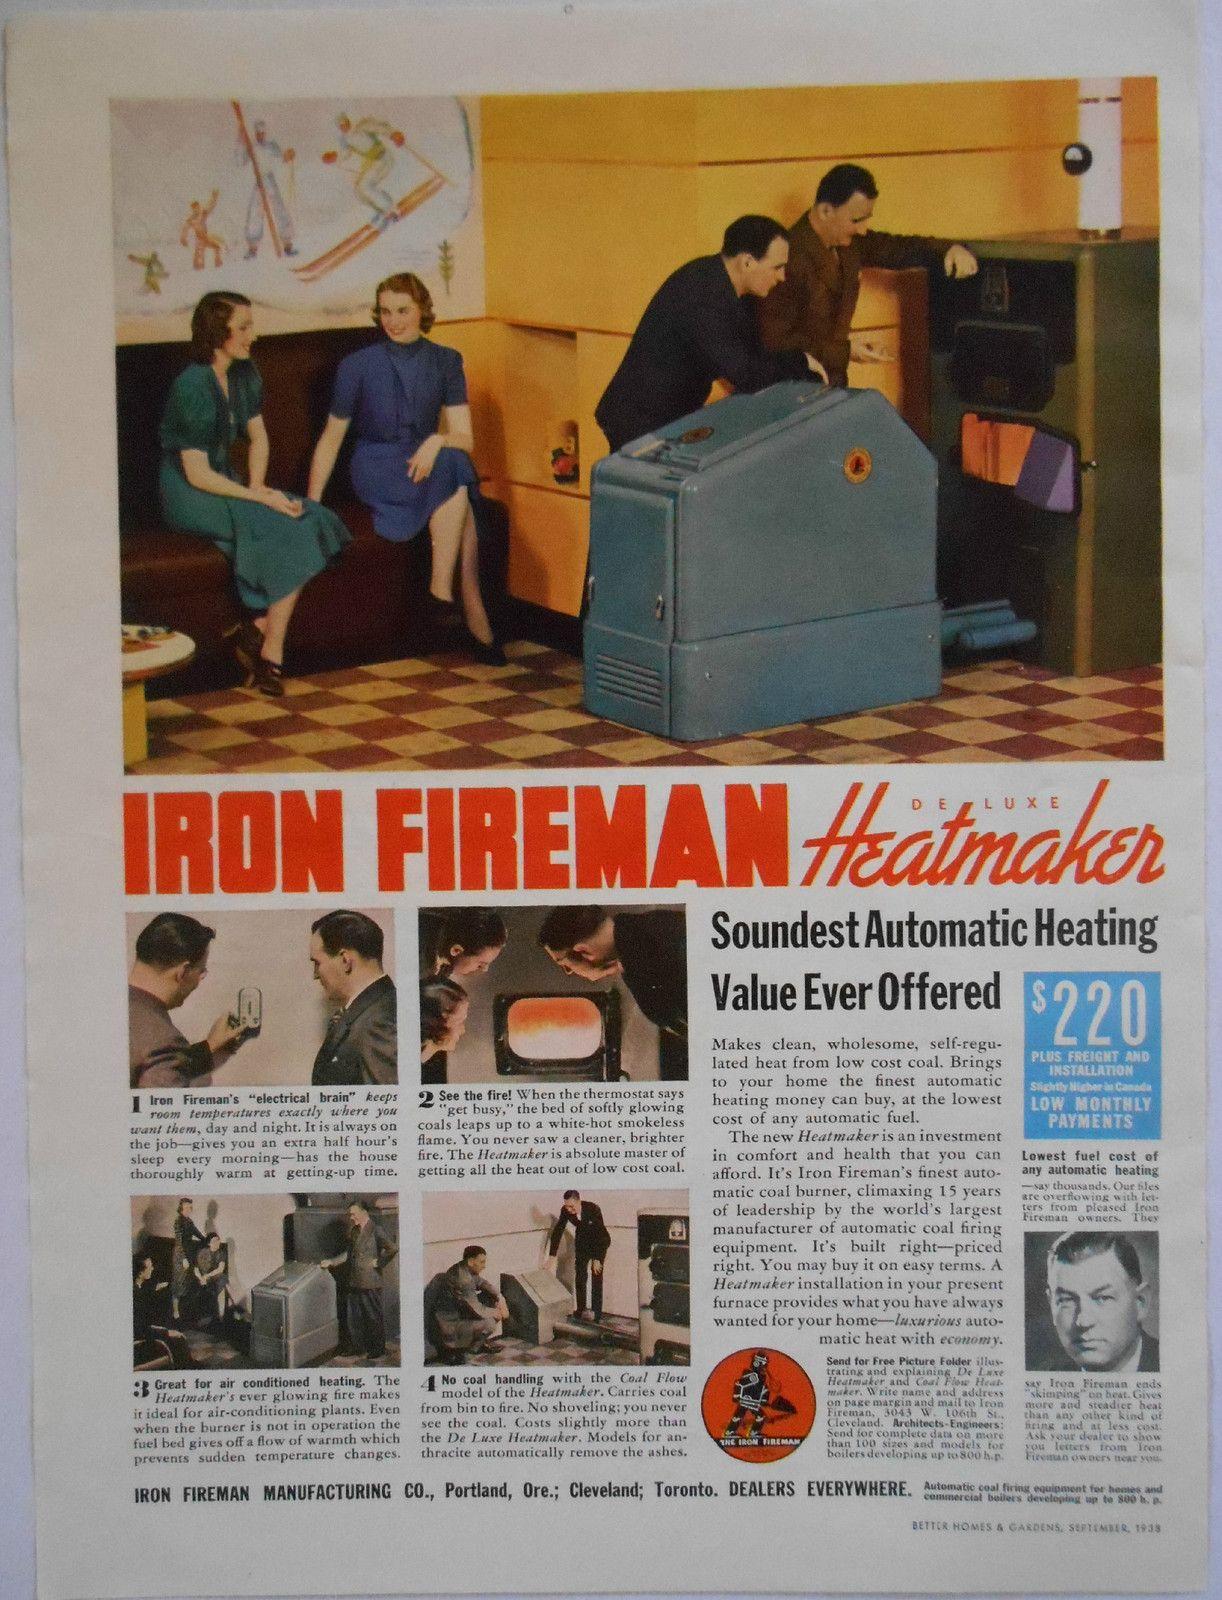 1938 Vintage Ad Iron Fireman Heatmaker Furnace with